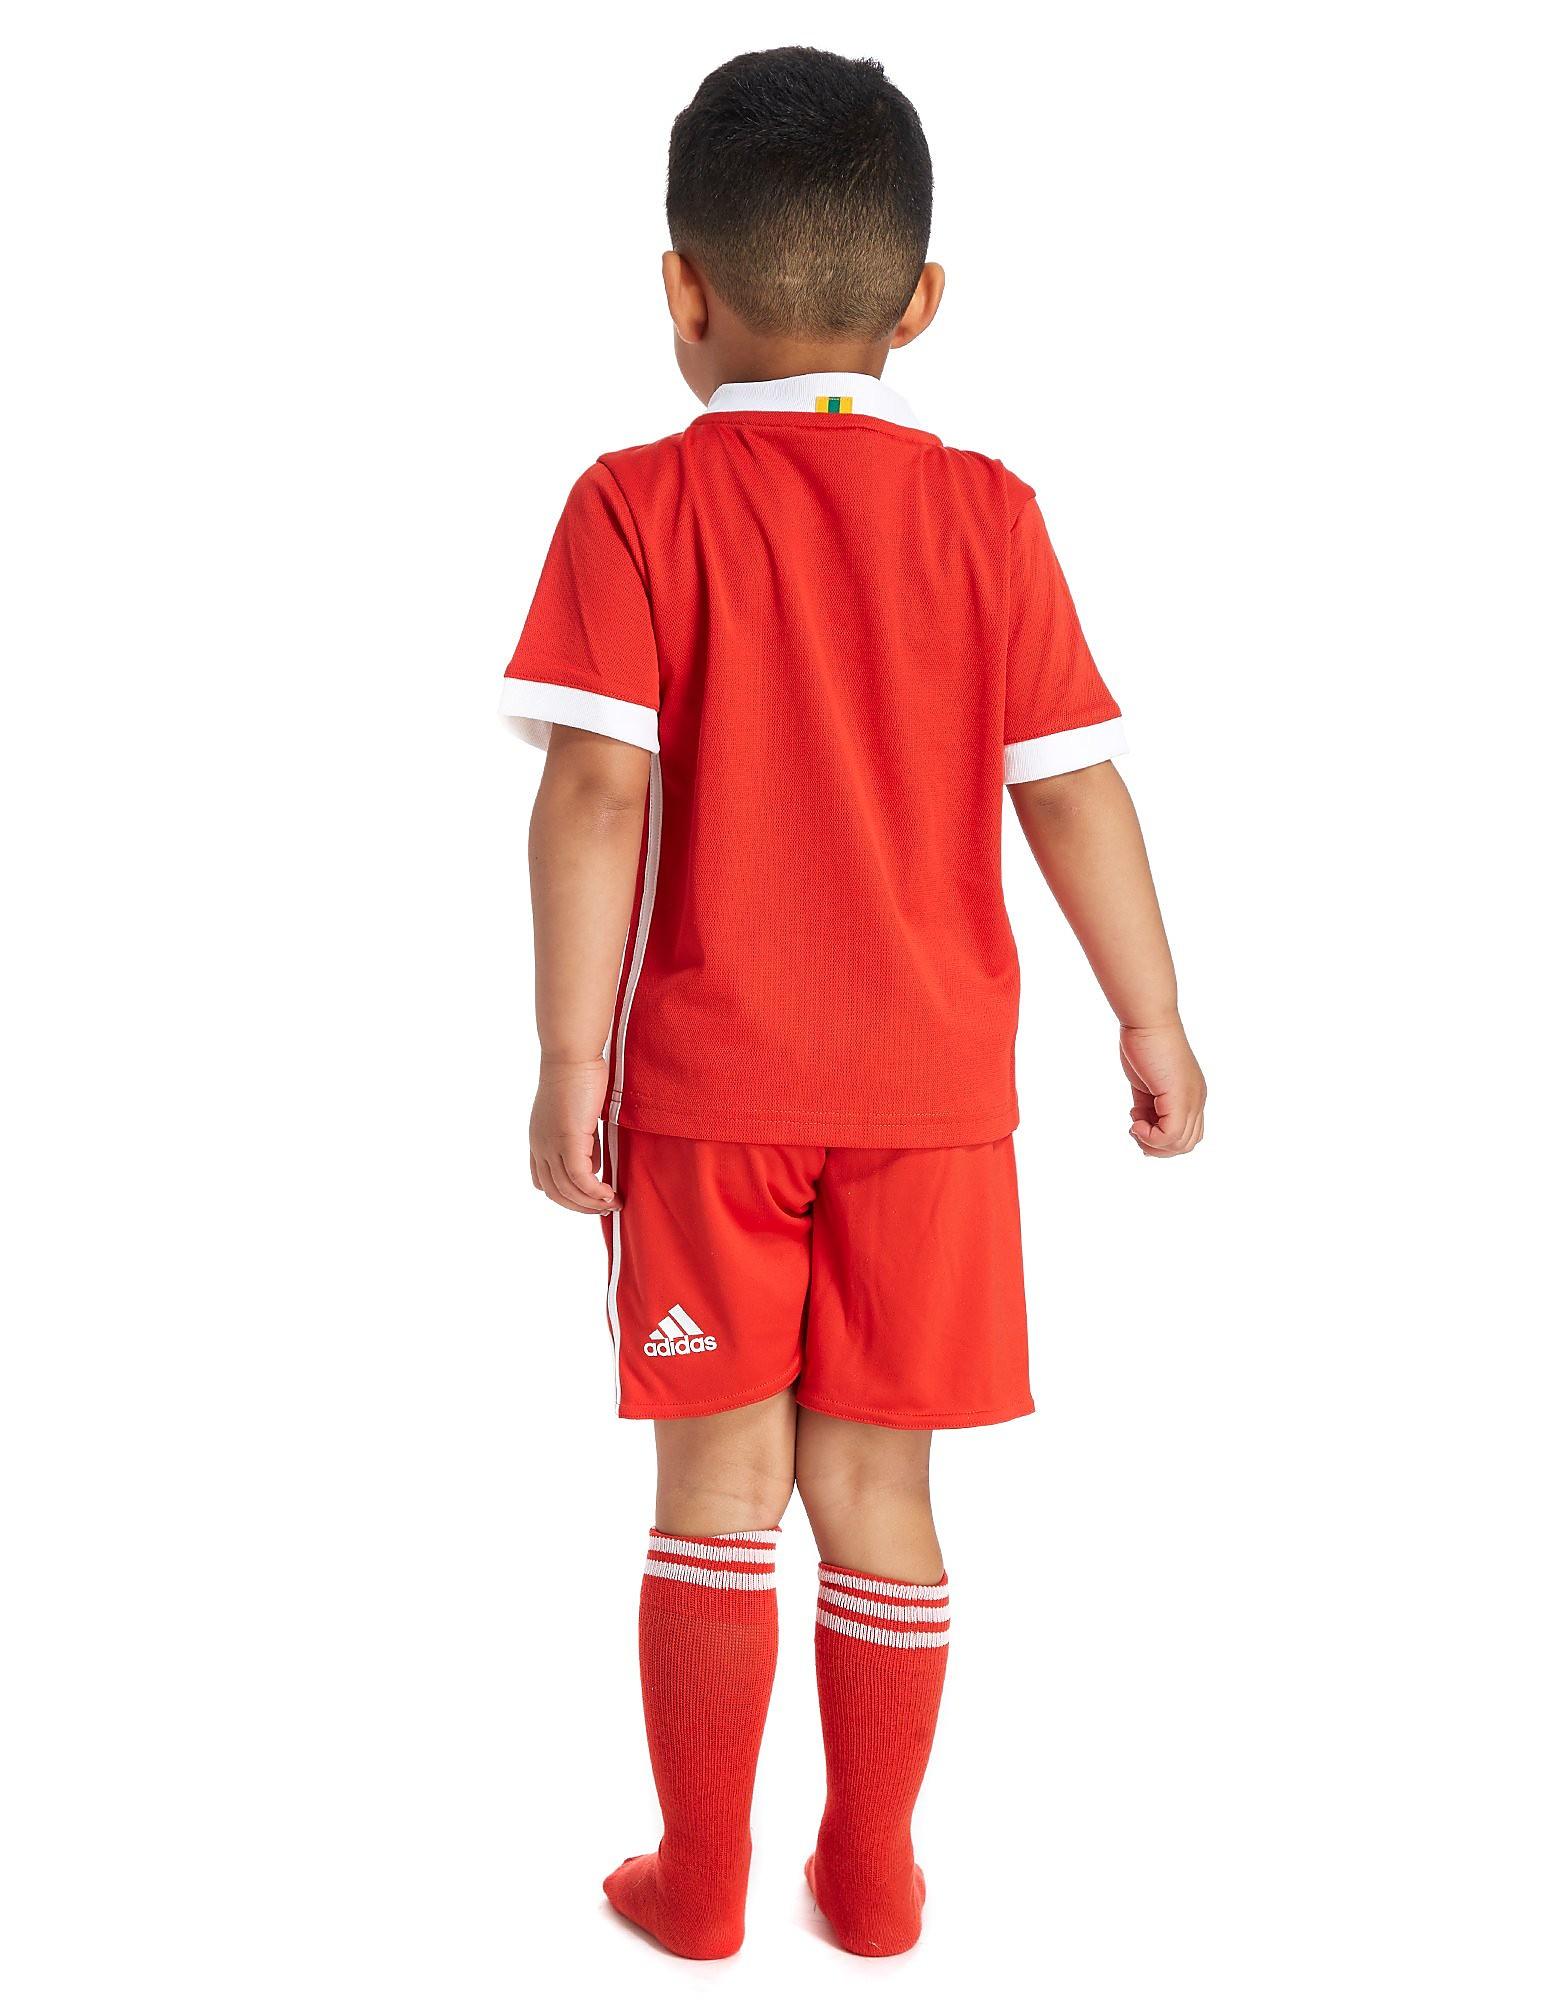 adidas Wales 2017/18 Home Kit Children